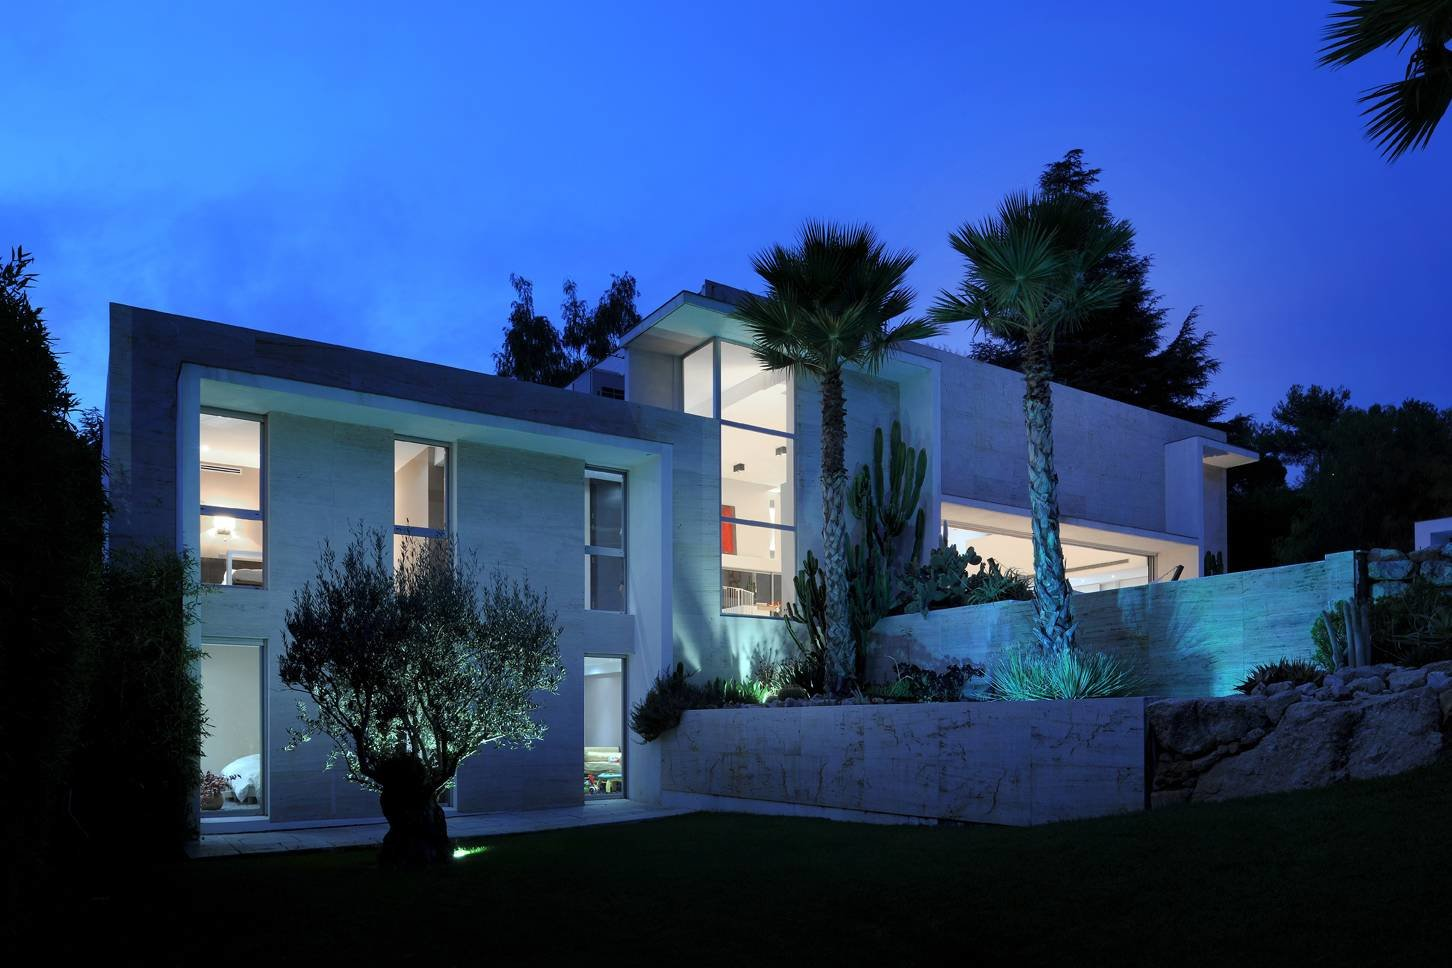 Vendita Casa - Biot Bois Fleuri - Francia